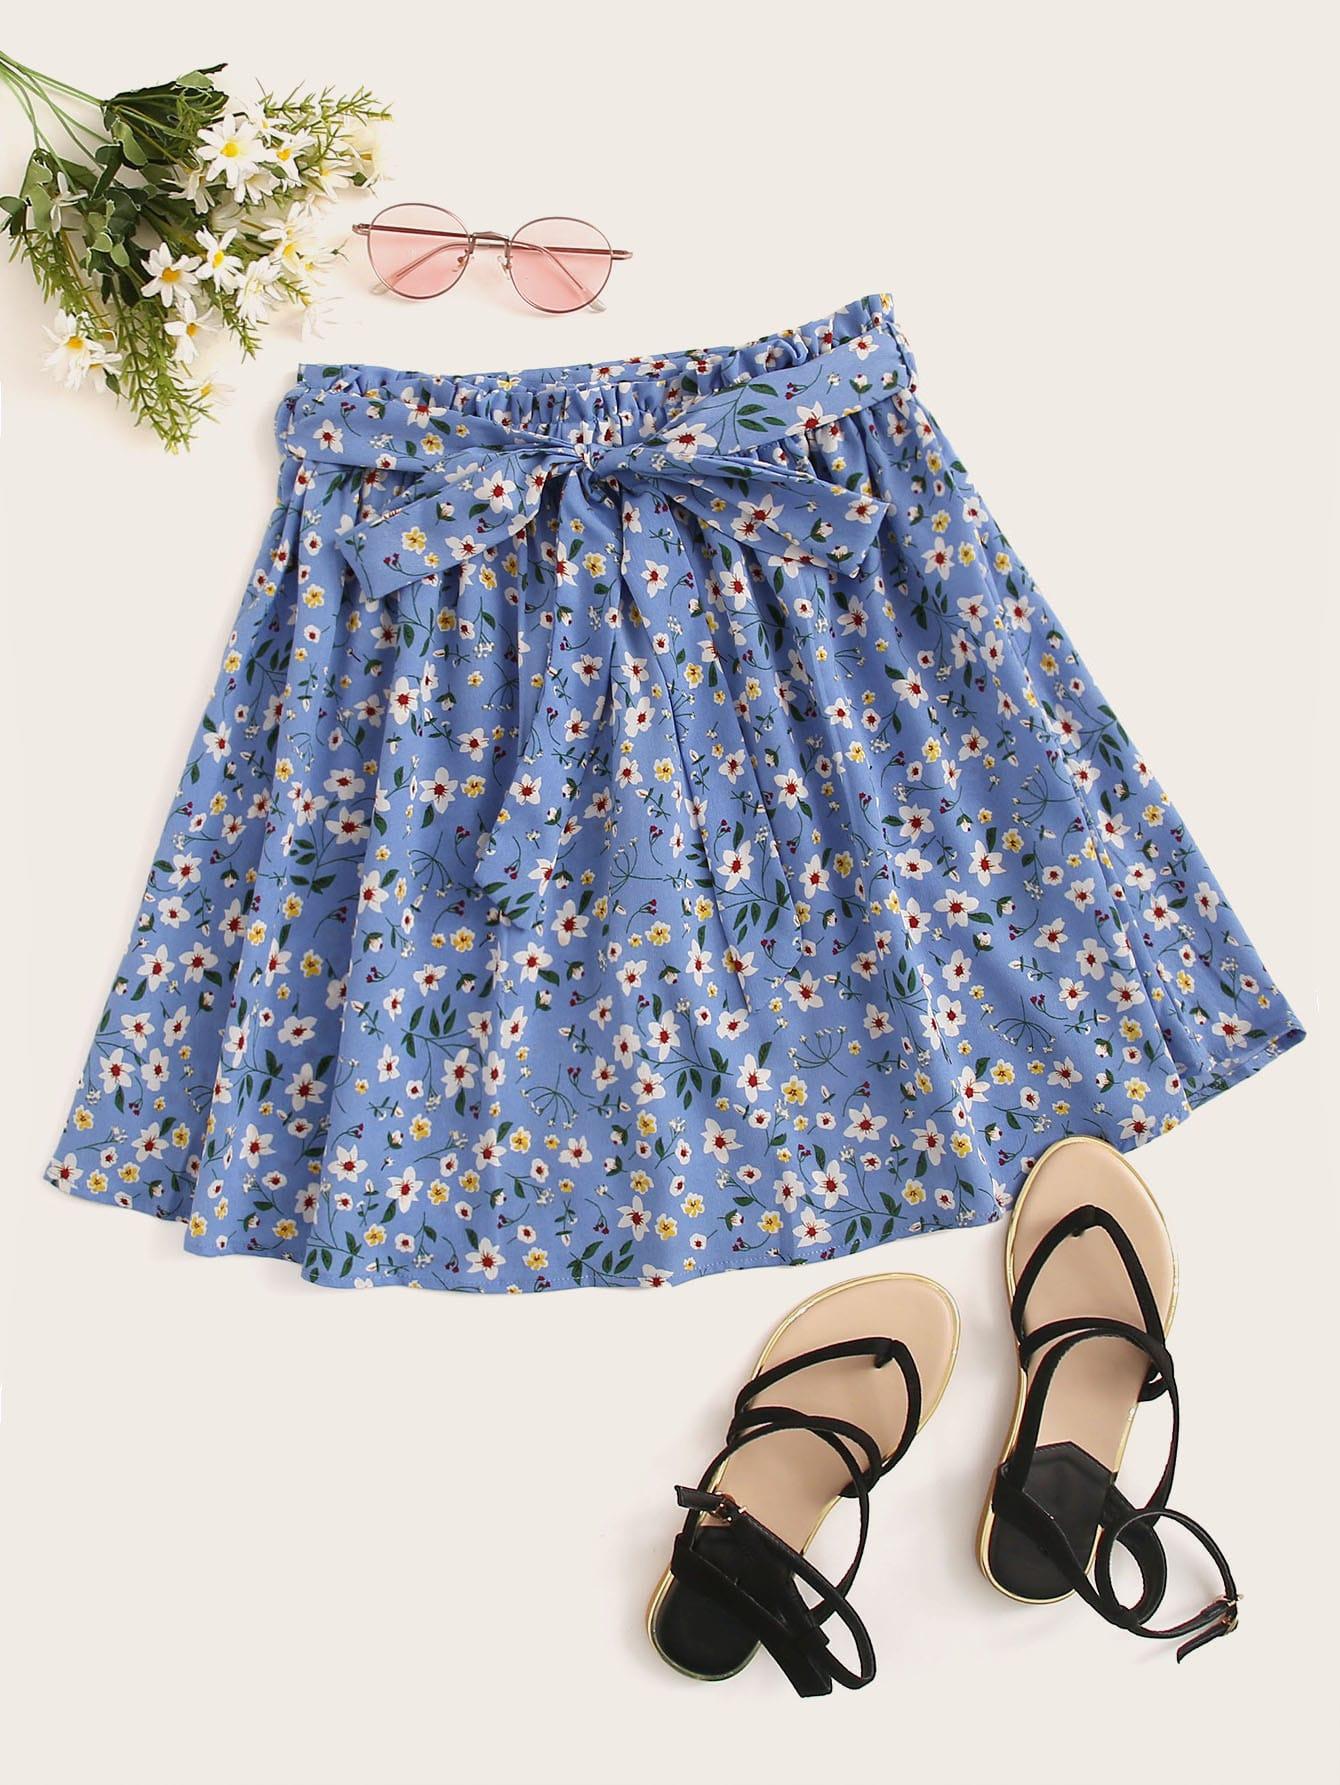 Фото - Цветочная юбка с поясом от SheIn синего цвета